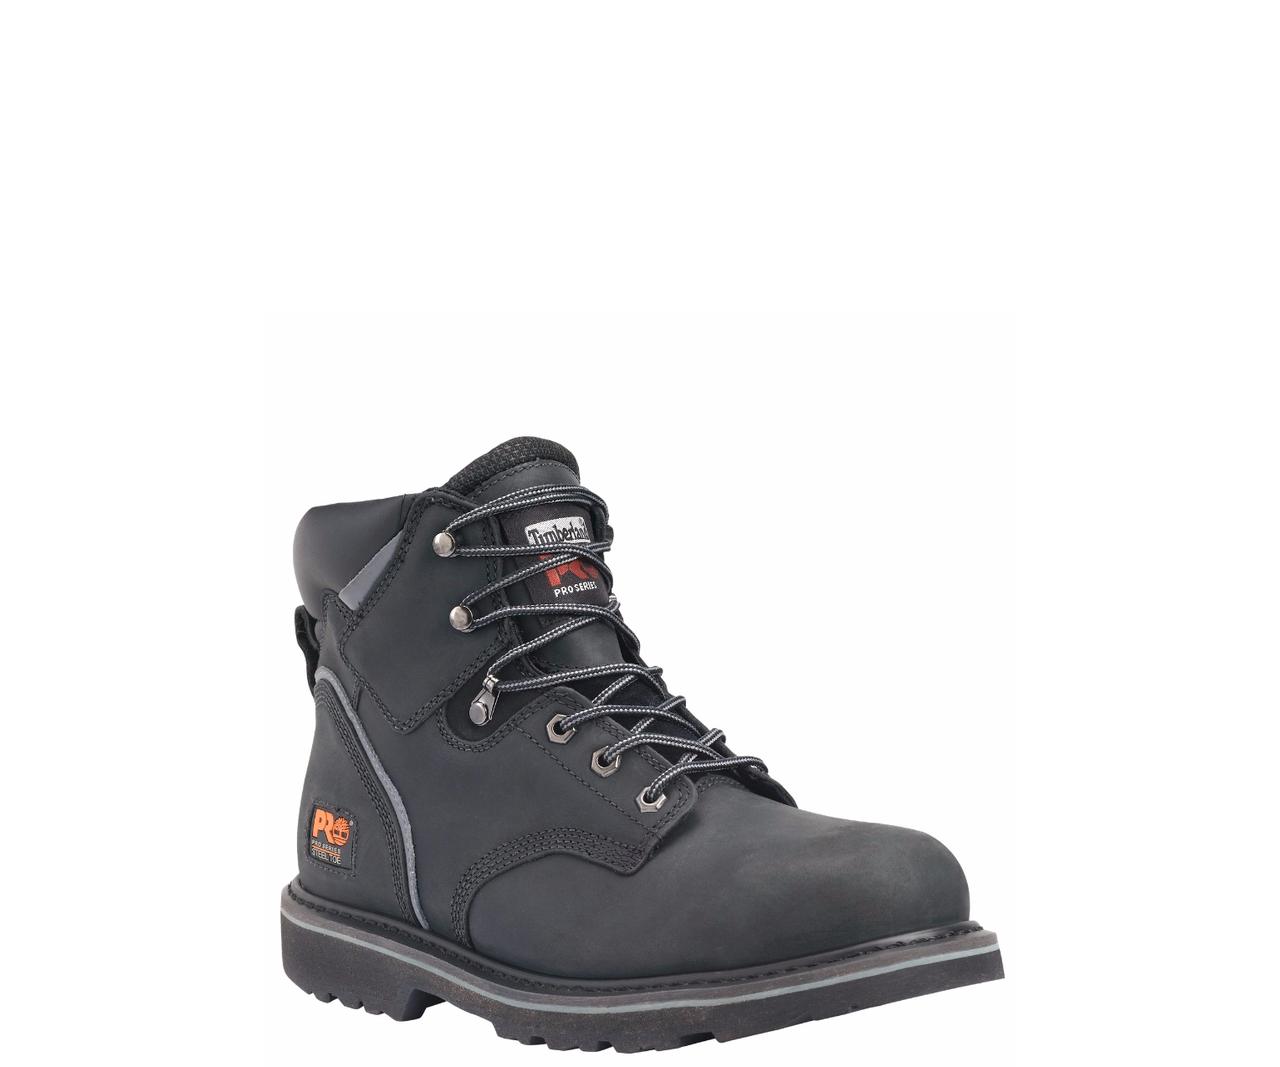 Timberland Pro Pit Boss 6″ Black Steel Toe Work Boots